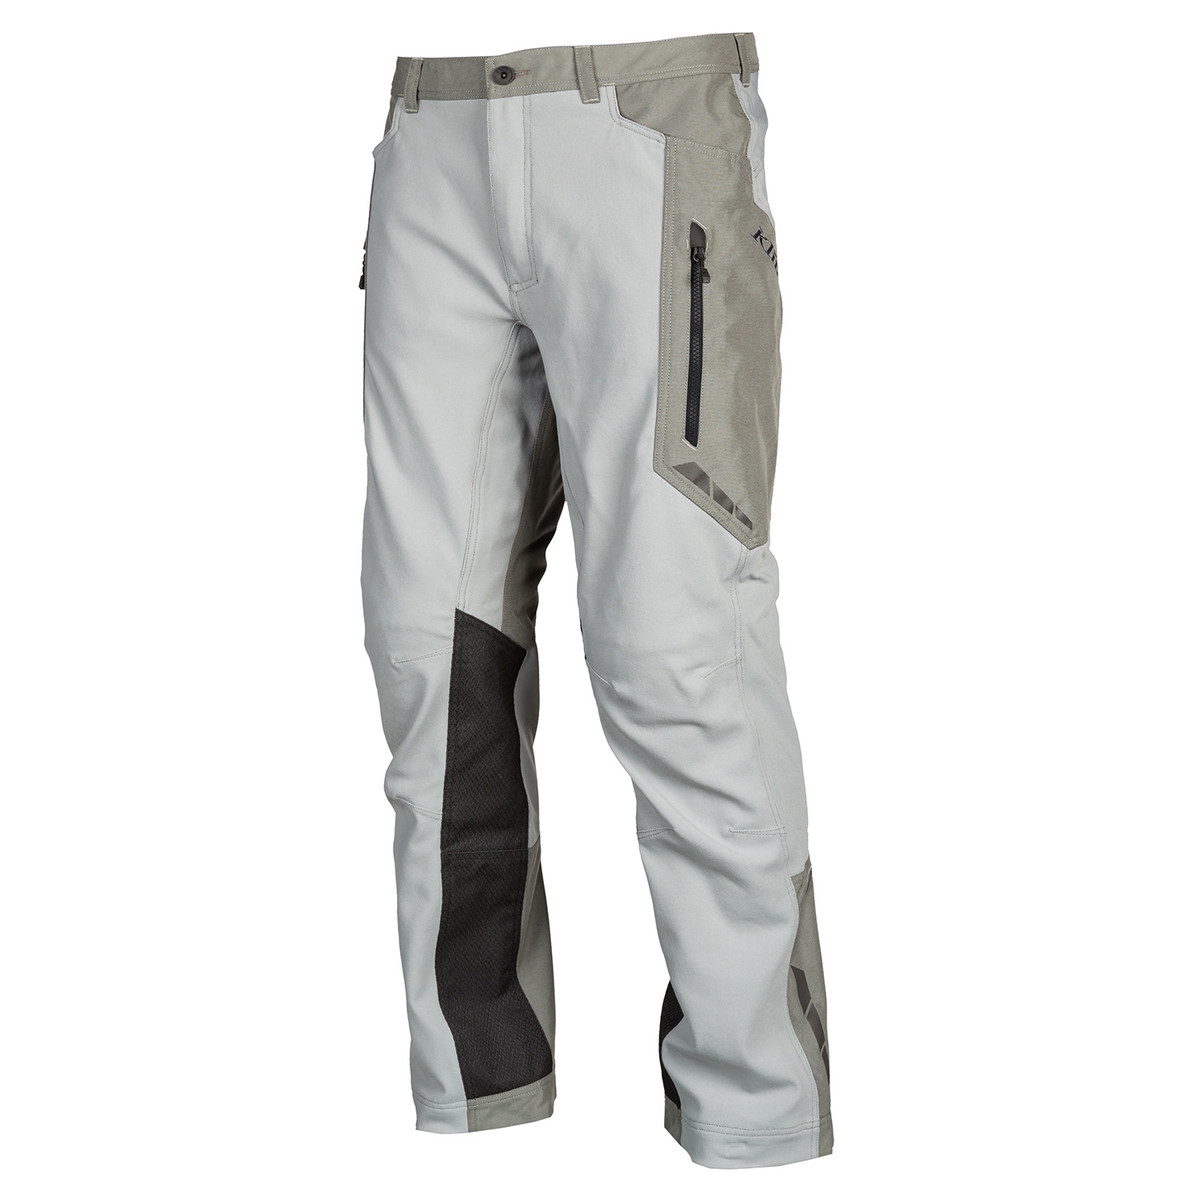 KLIM Marrakesh Pantalon Moto Gris 32